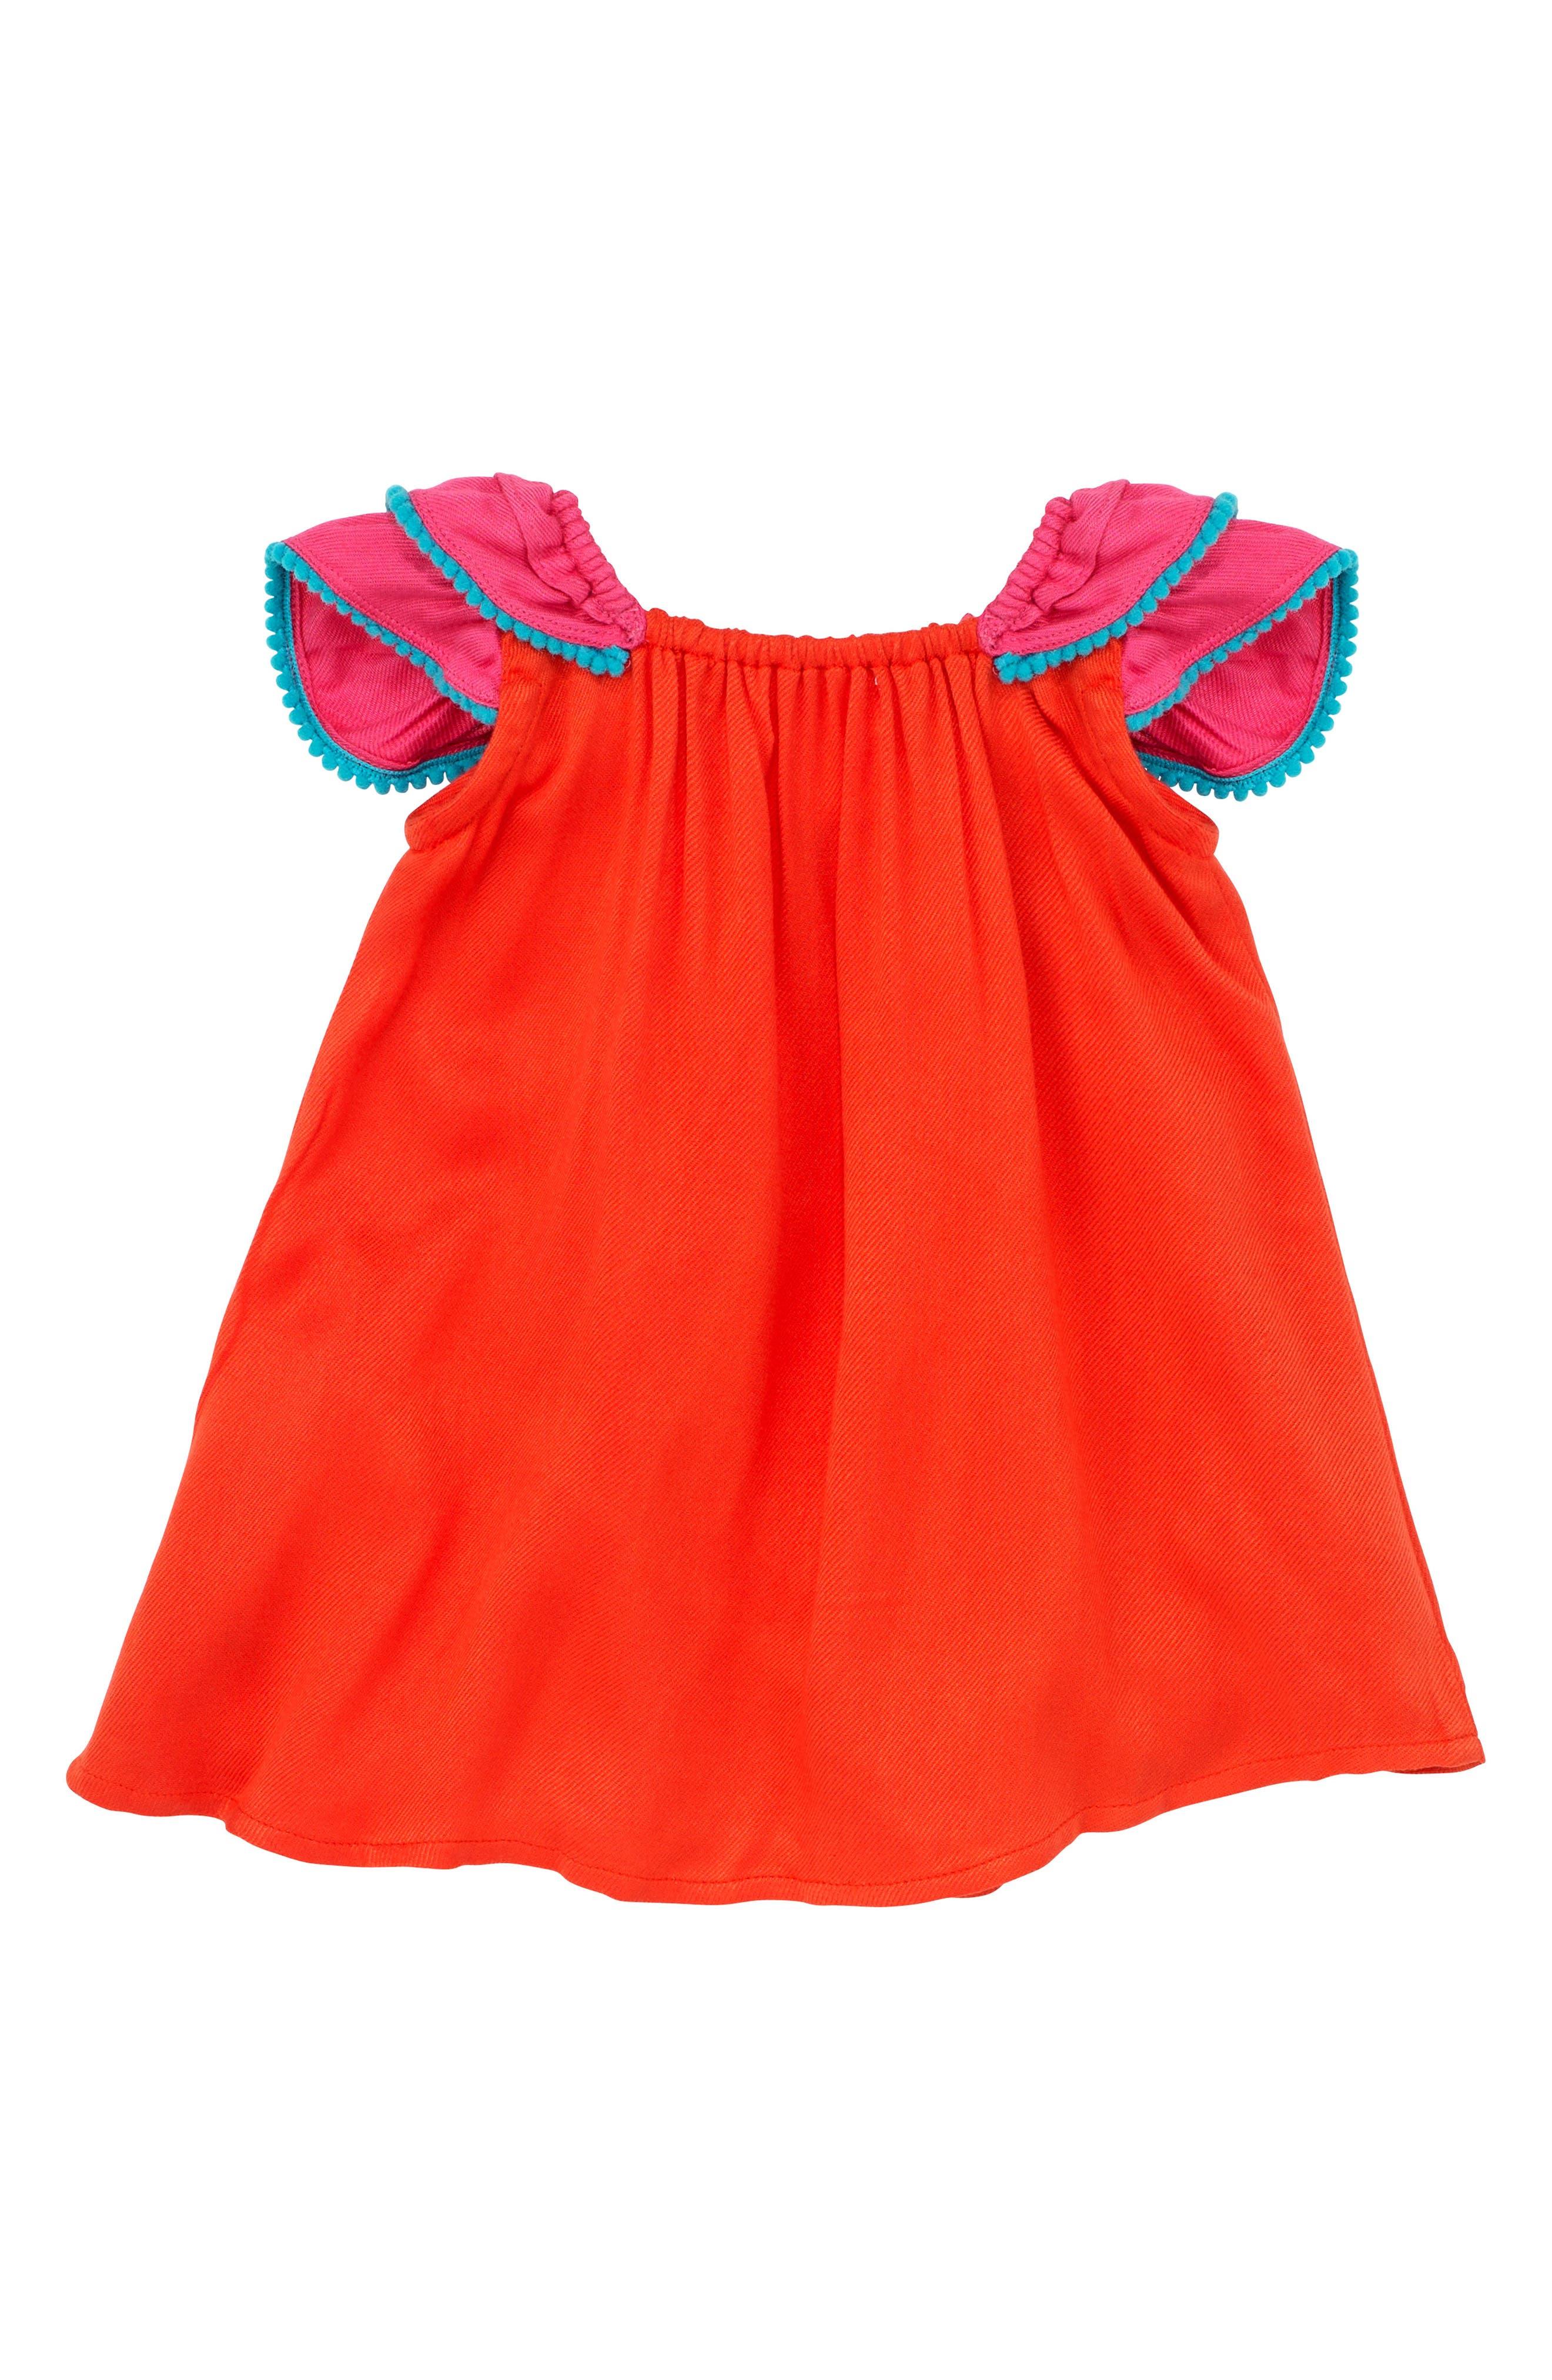 Pompom Dress,                             Alternate thumbnail 2, color,                             950